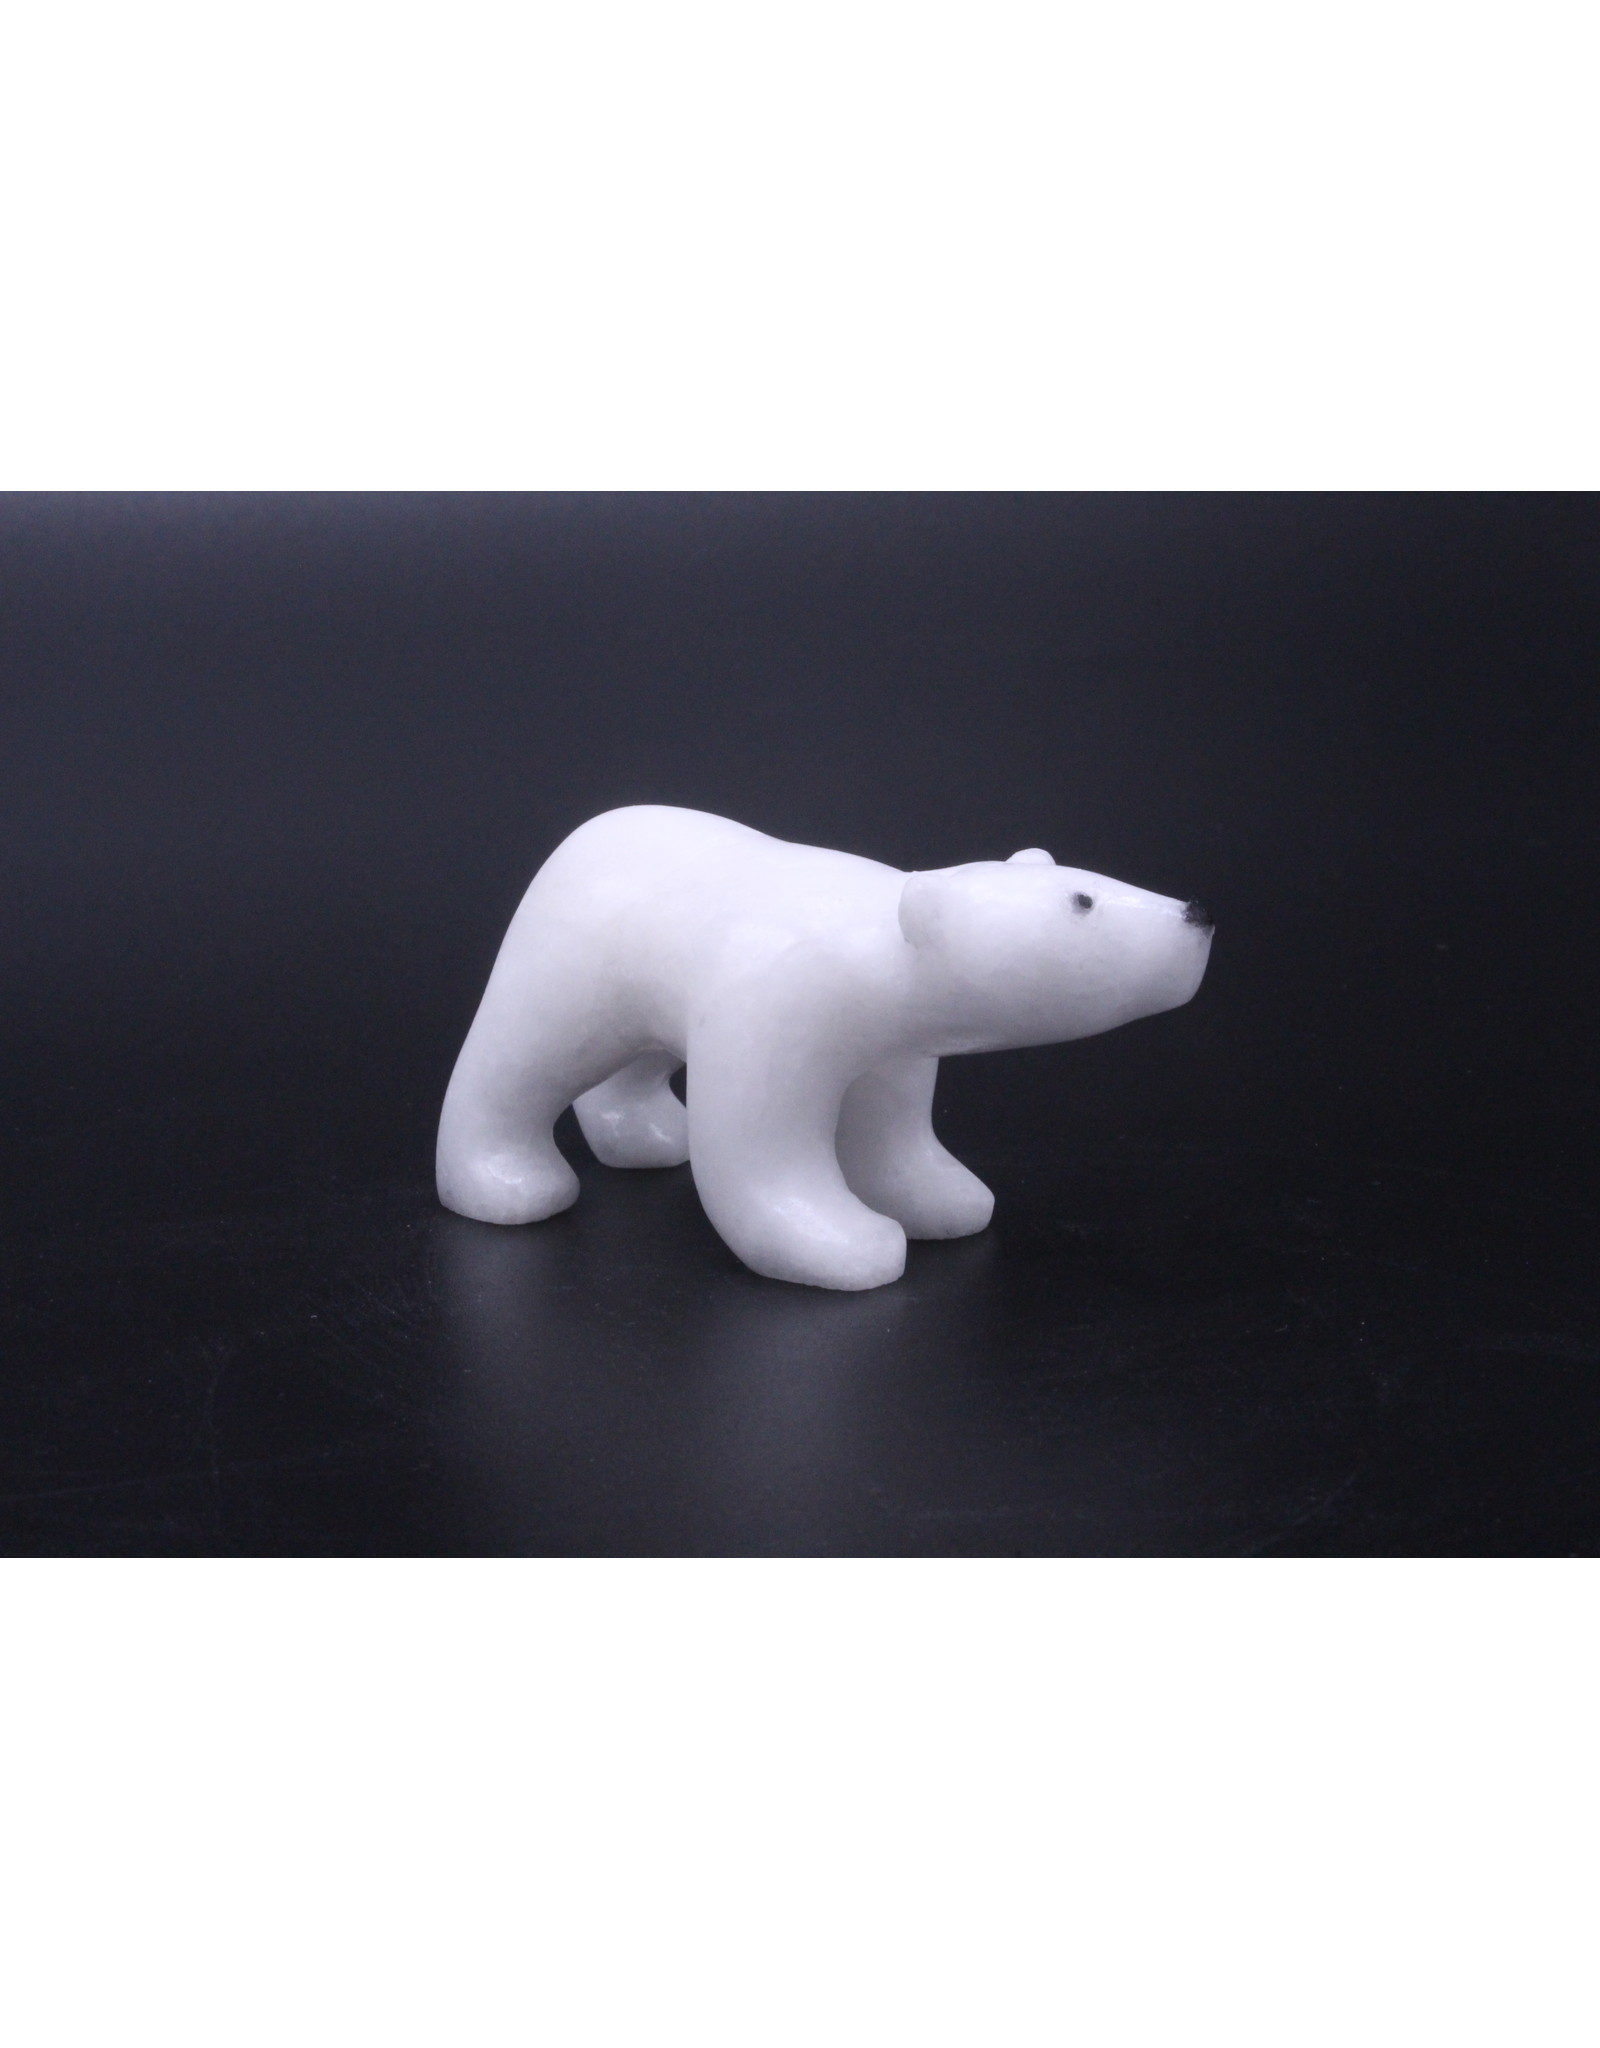 Bear by Peter John Mitchell - 8412